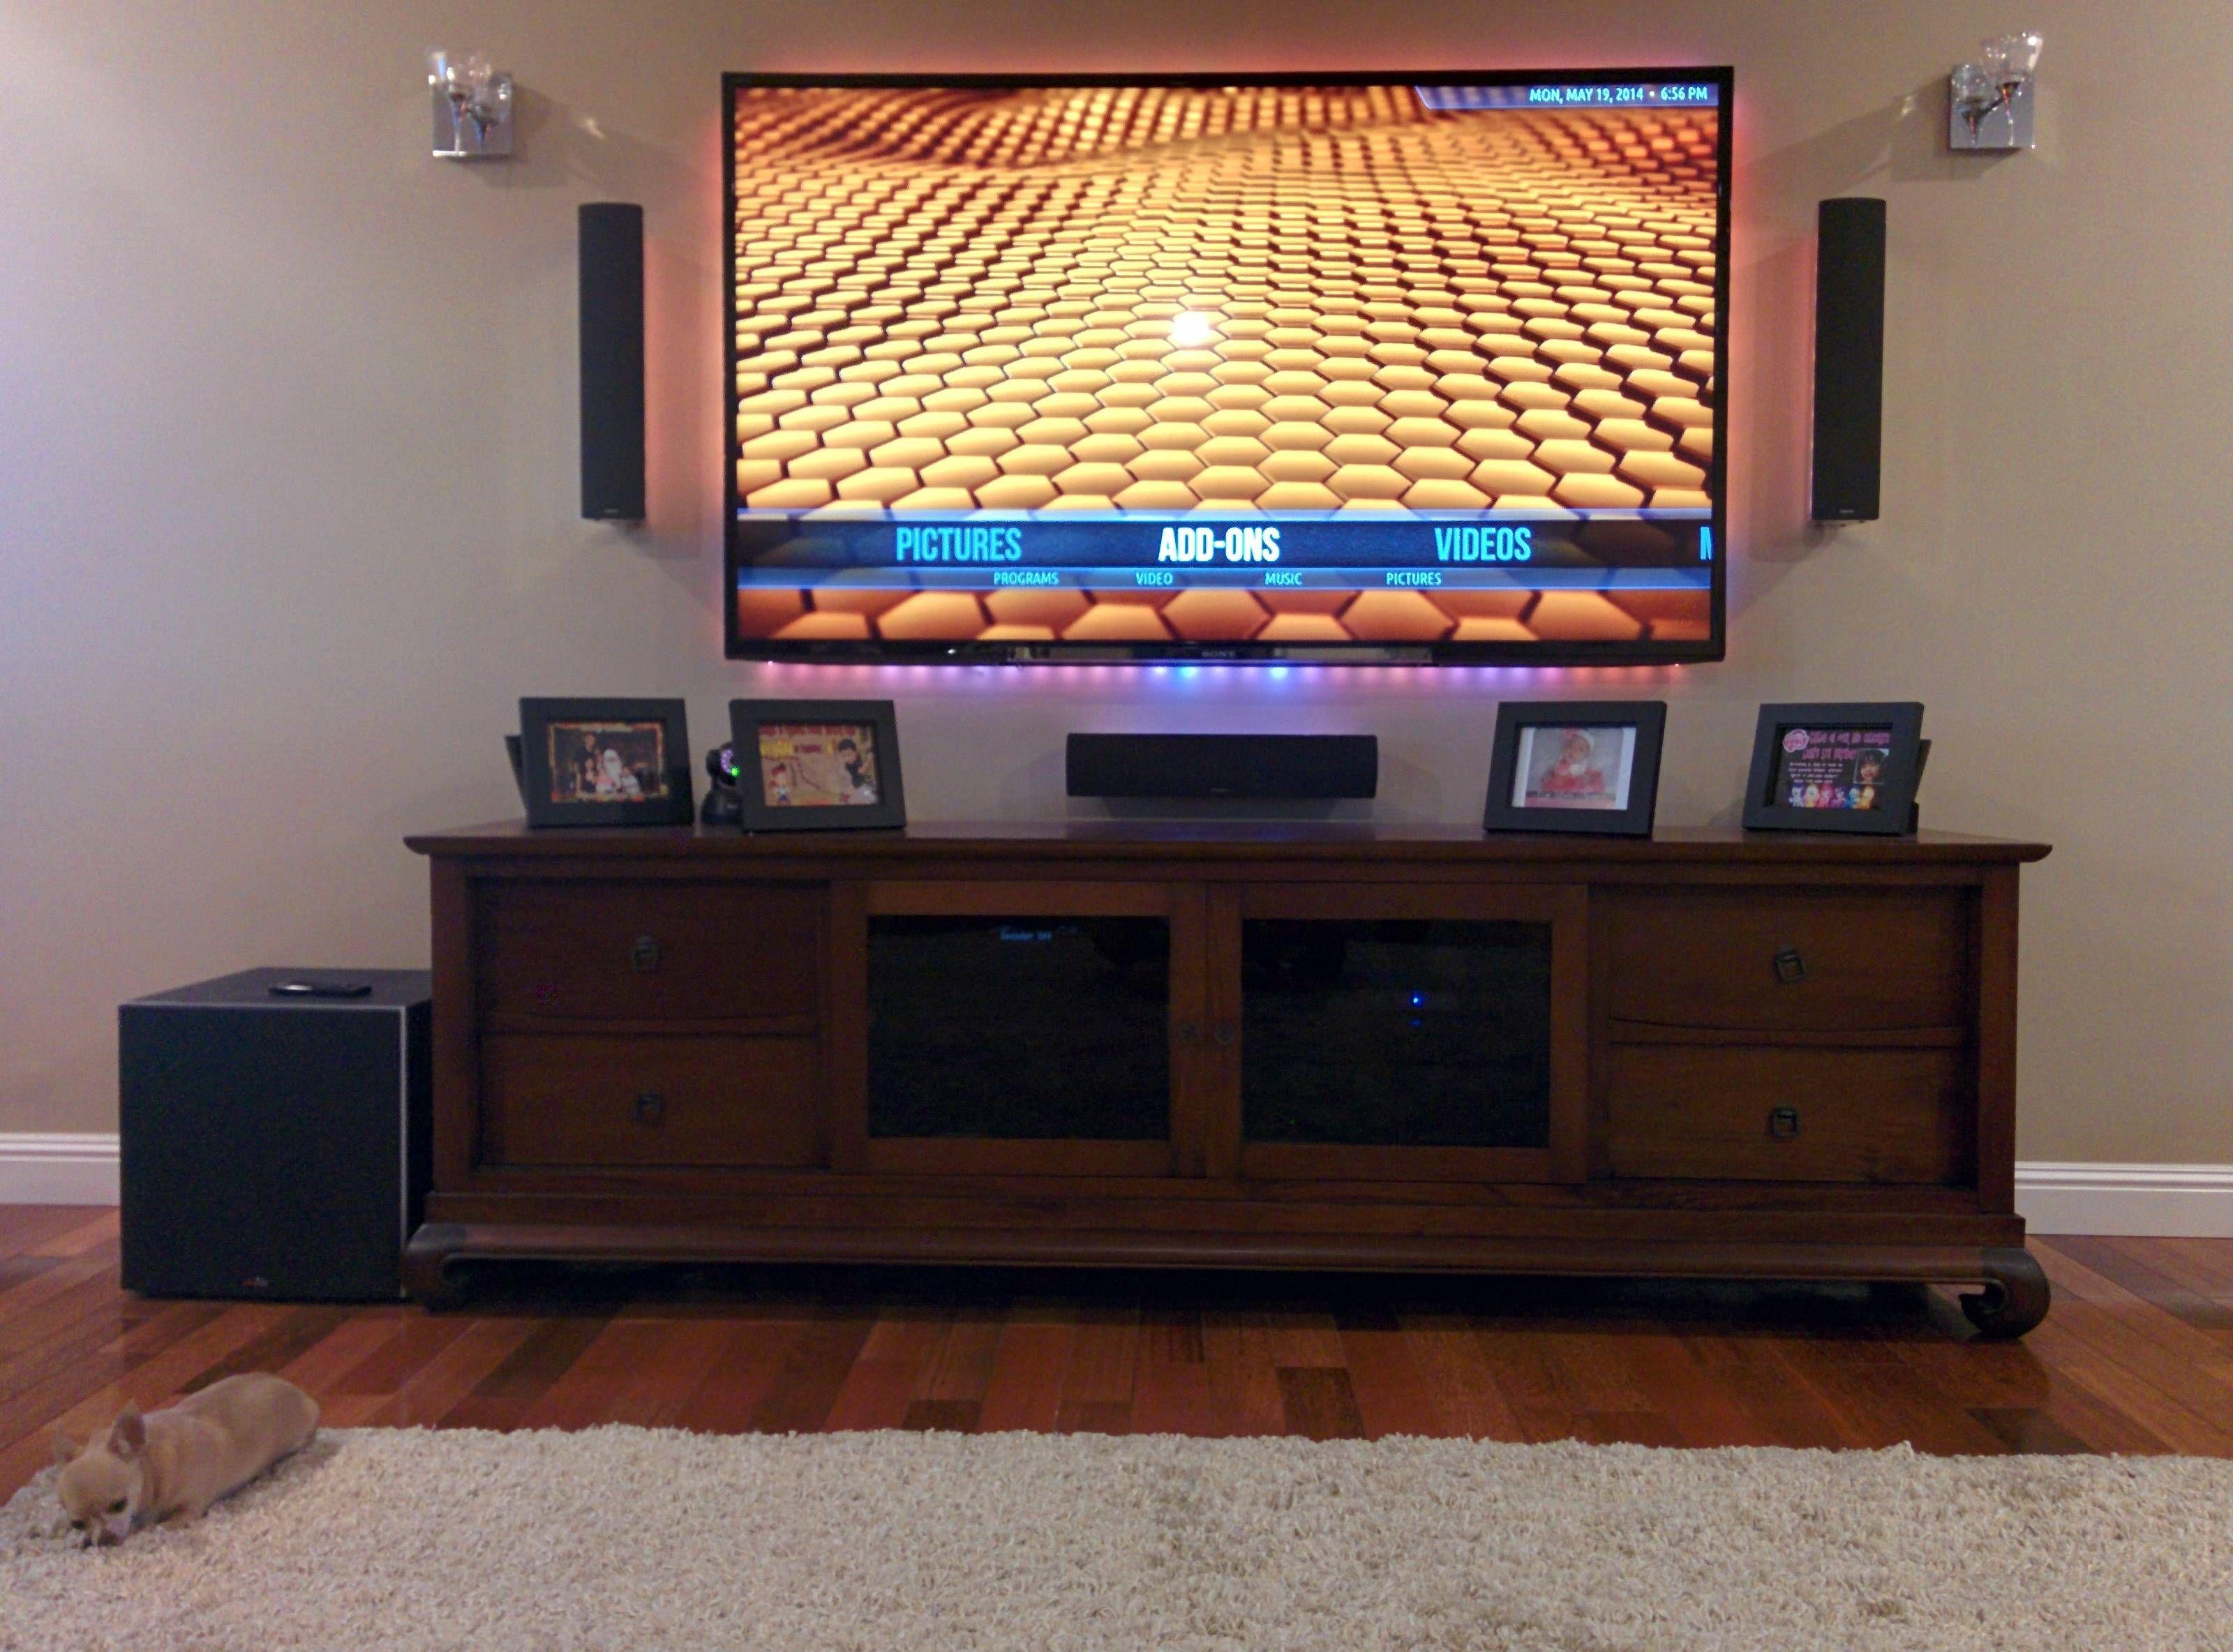 Nice Tv Setup By Reddit User Noxqcs808 Interface Audio Video